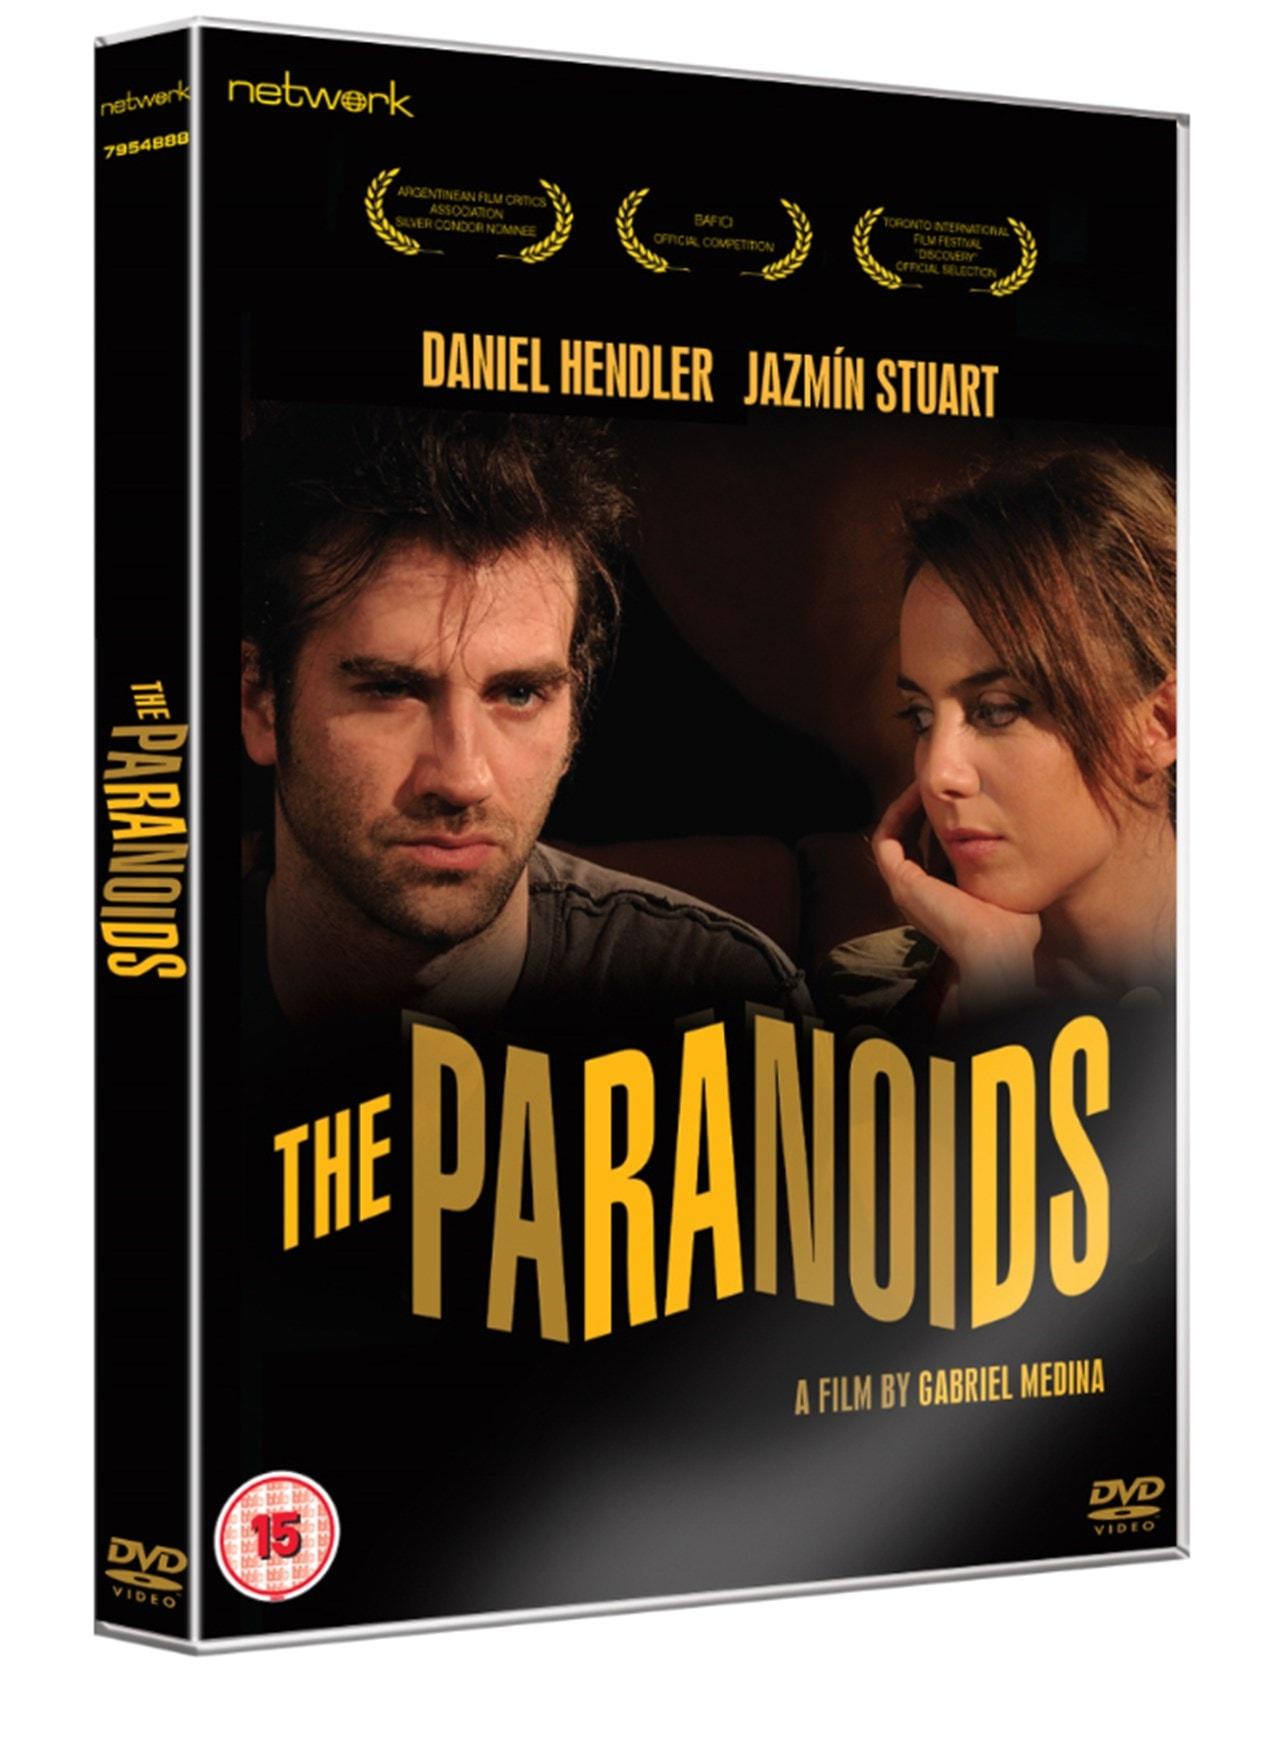 The Paranoids - 2